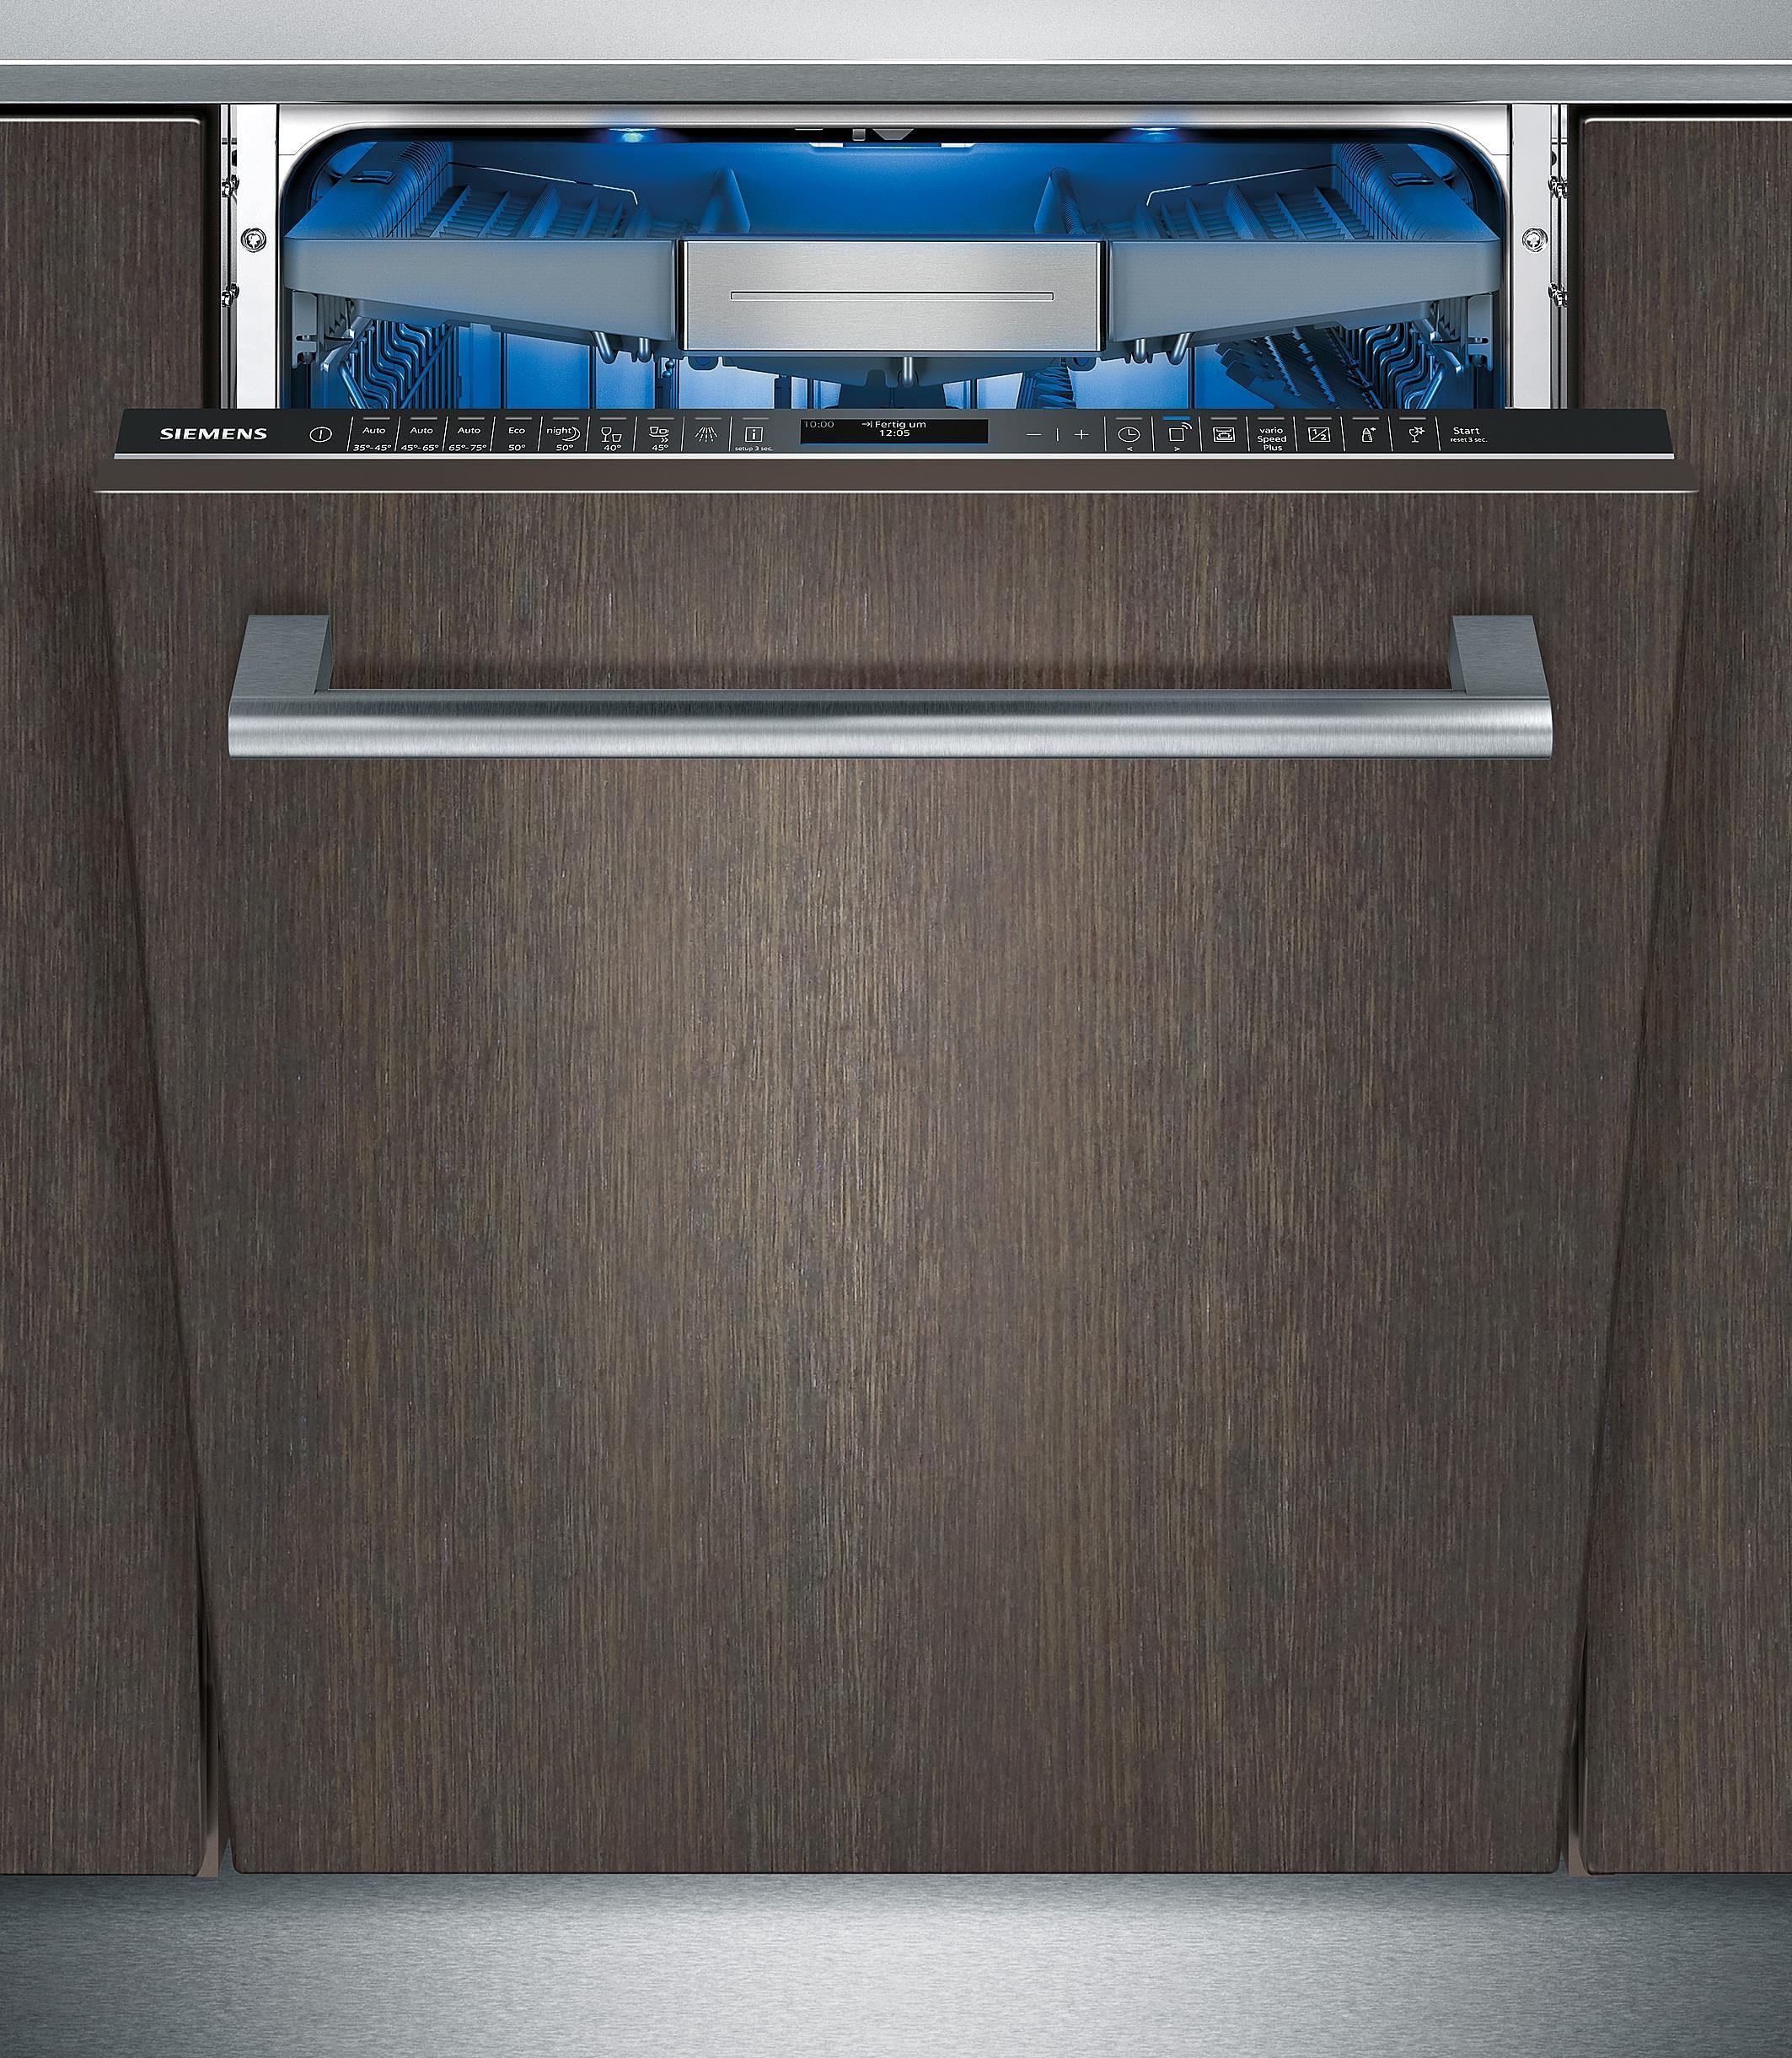 Siemens vollintegrierbarer Einbaugeschirrspüler SX678X26TE, A+++, 7,5 Liter, 13 Maßgedecke